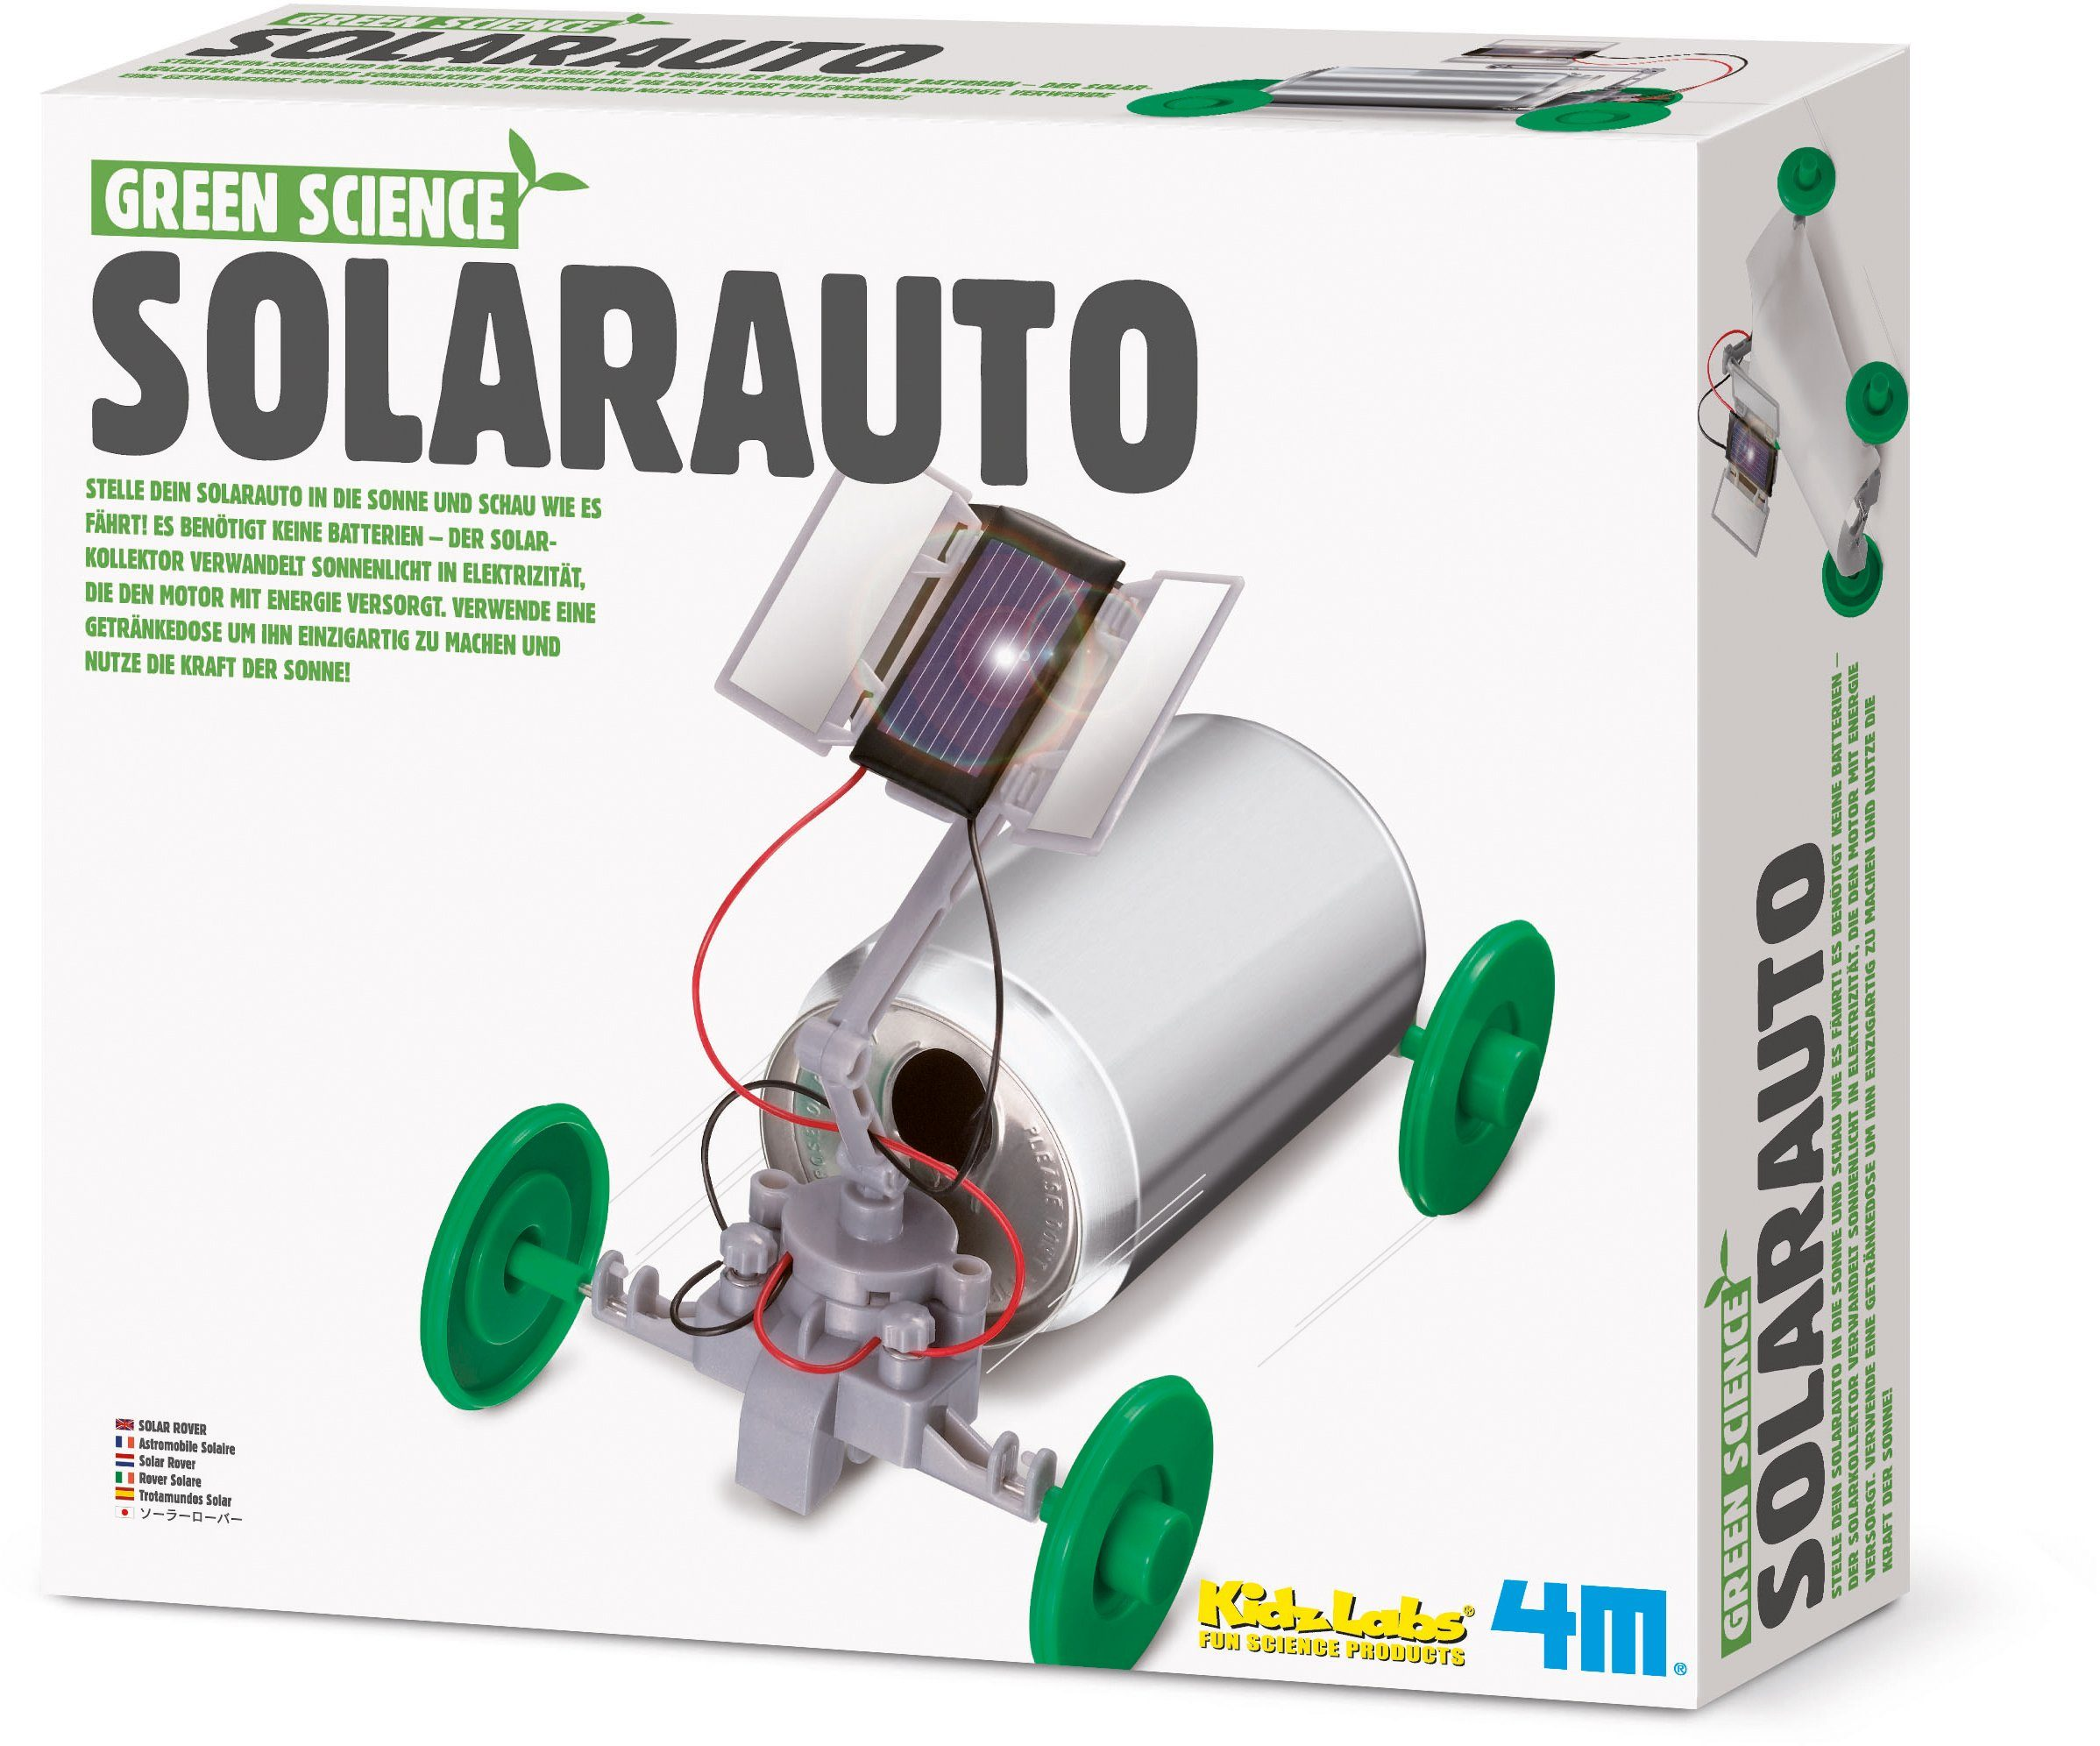 4M Experimentierset , »Green Science Solarauto«